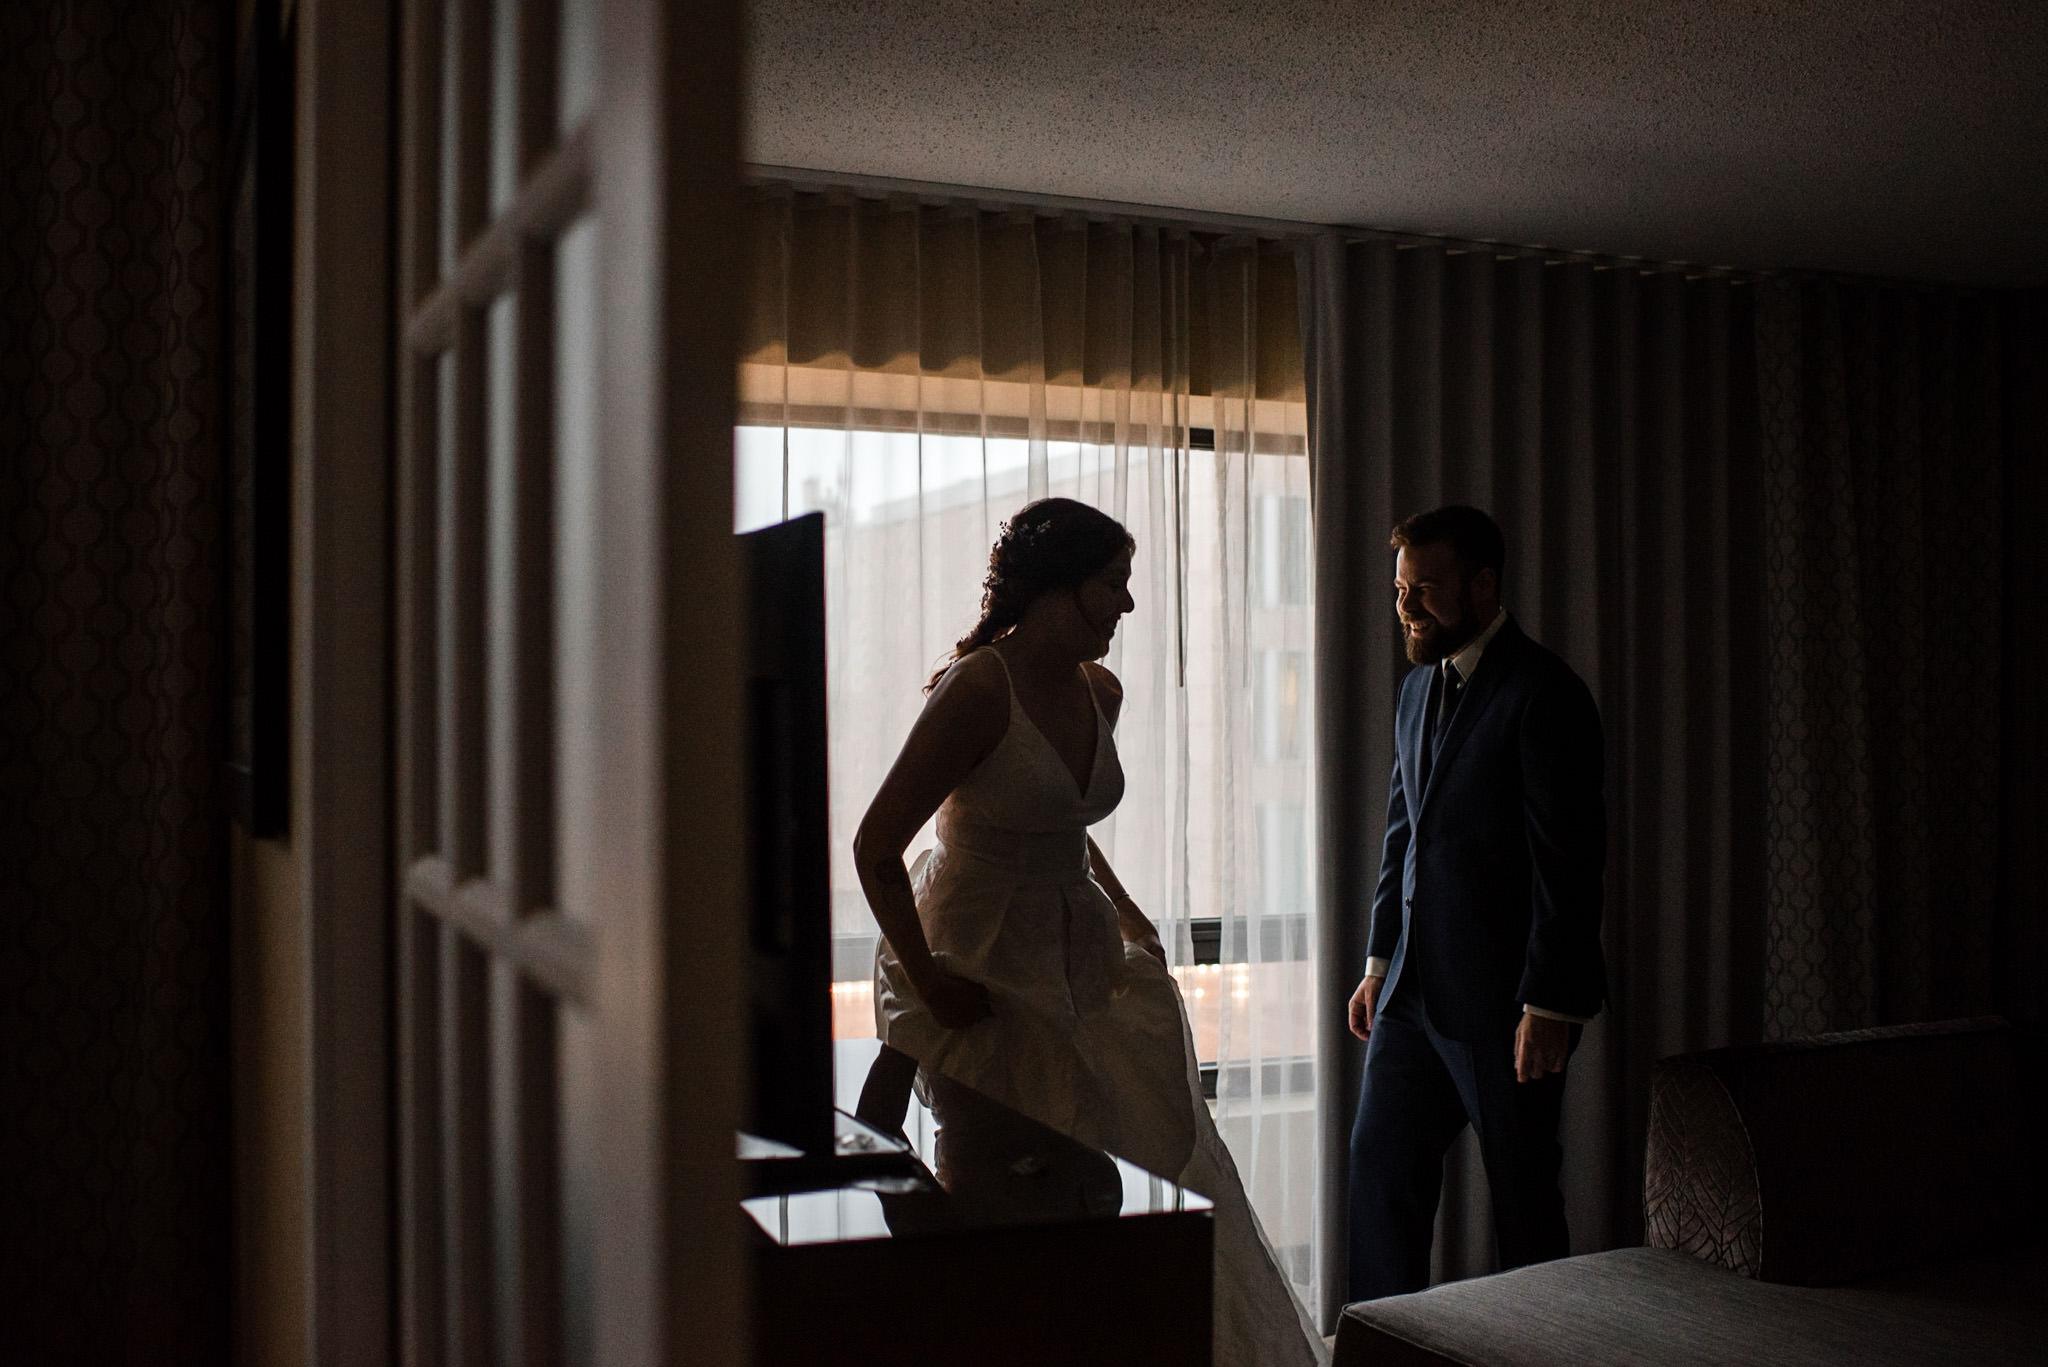 131-wedding-couple-getting-ready-toronto-hotel-rainy-day-photographer.jpg